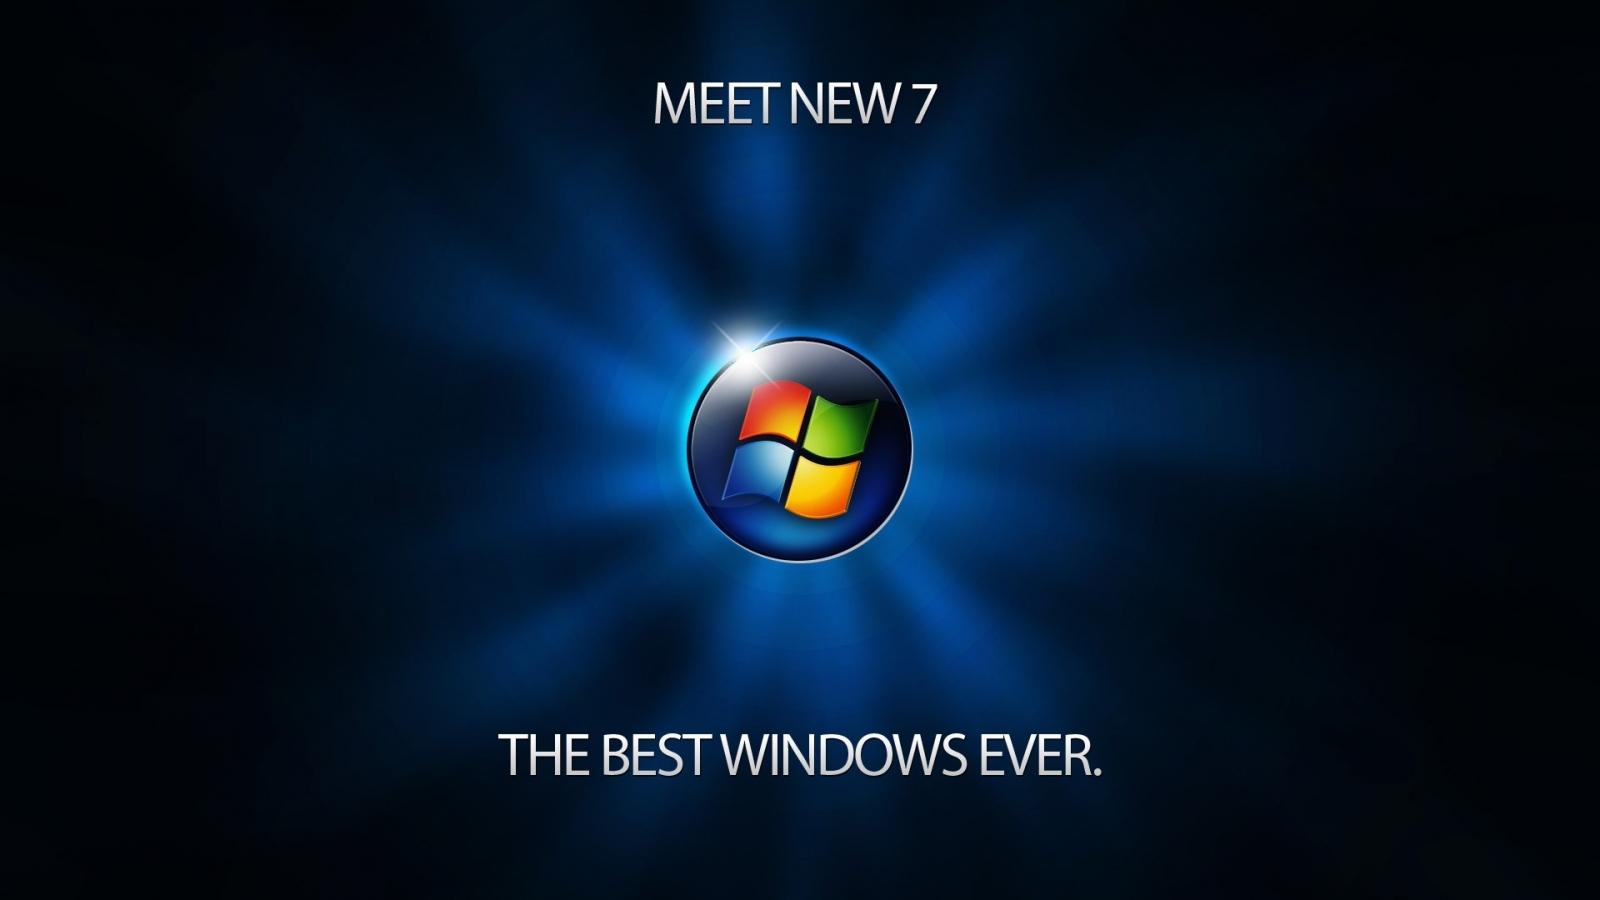 dark windows 7 microsoft windows alien 1600x900 wallpaper 104296 1600x900